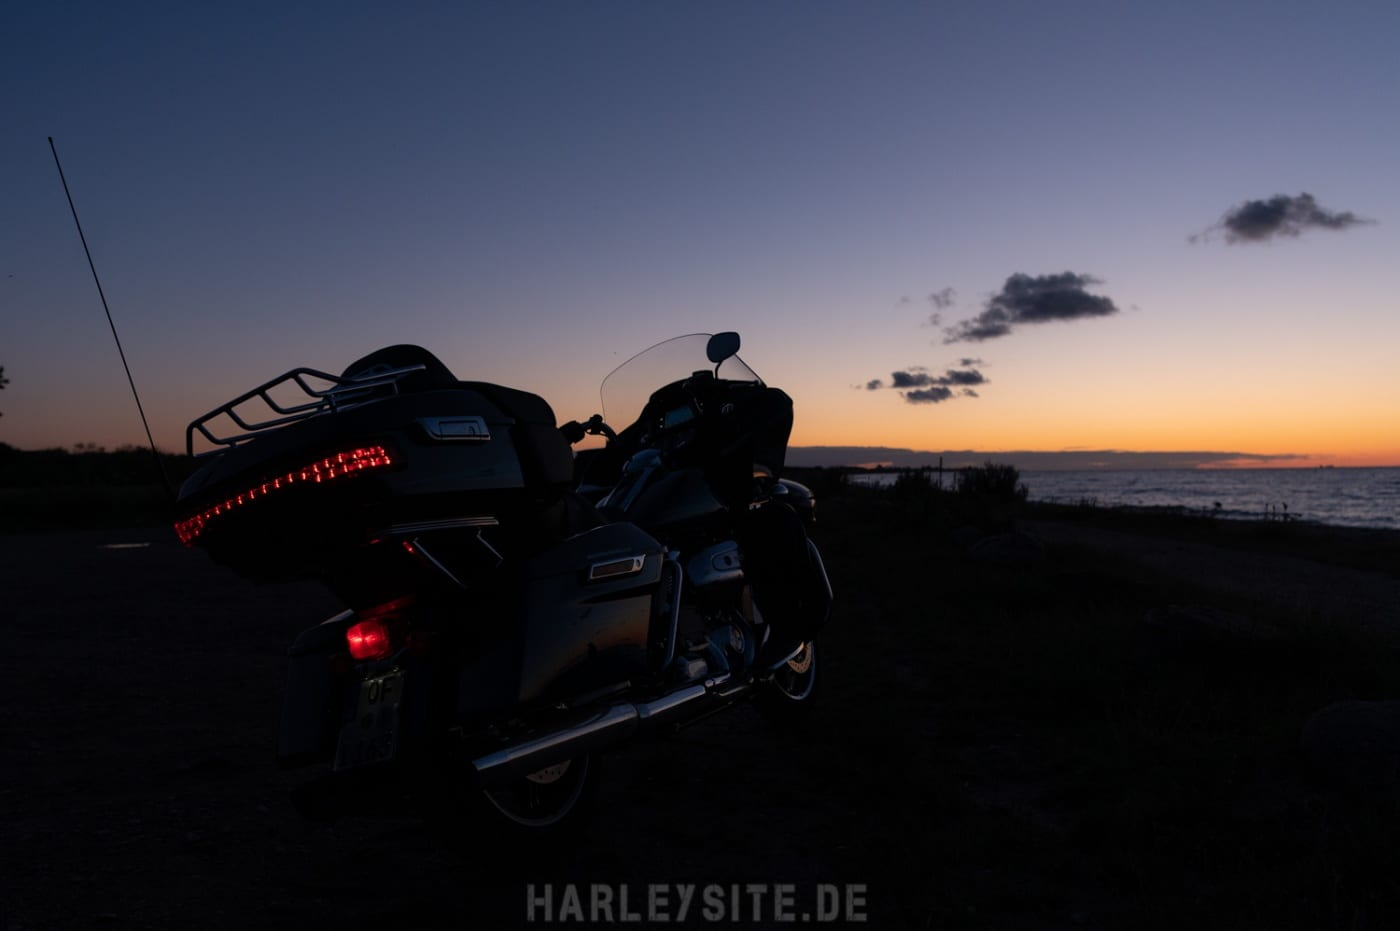 Sonnenuntergang an der Ostsee Road Glide Limited 2020